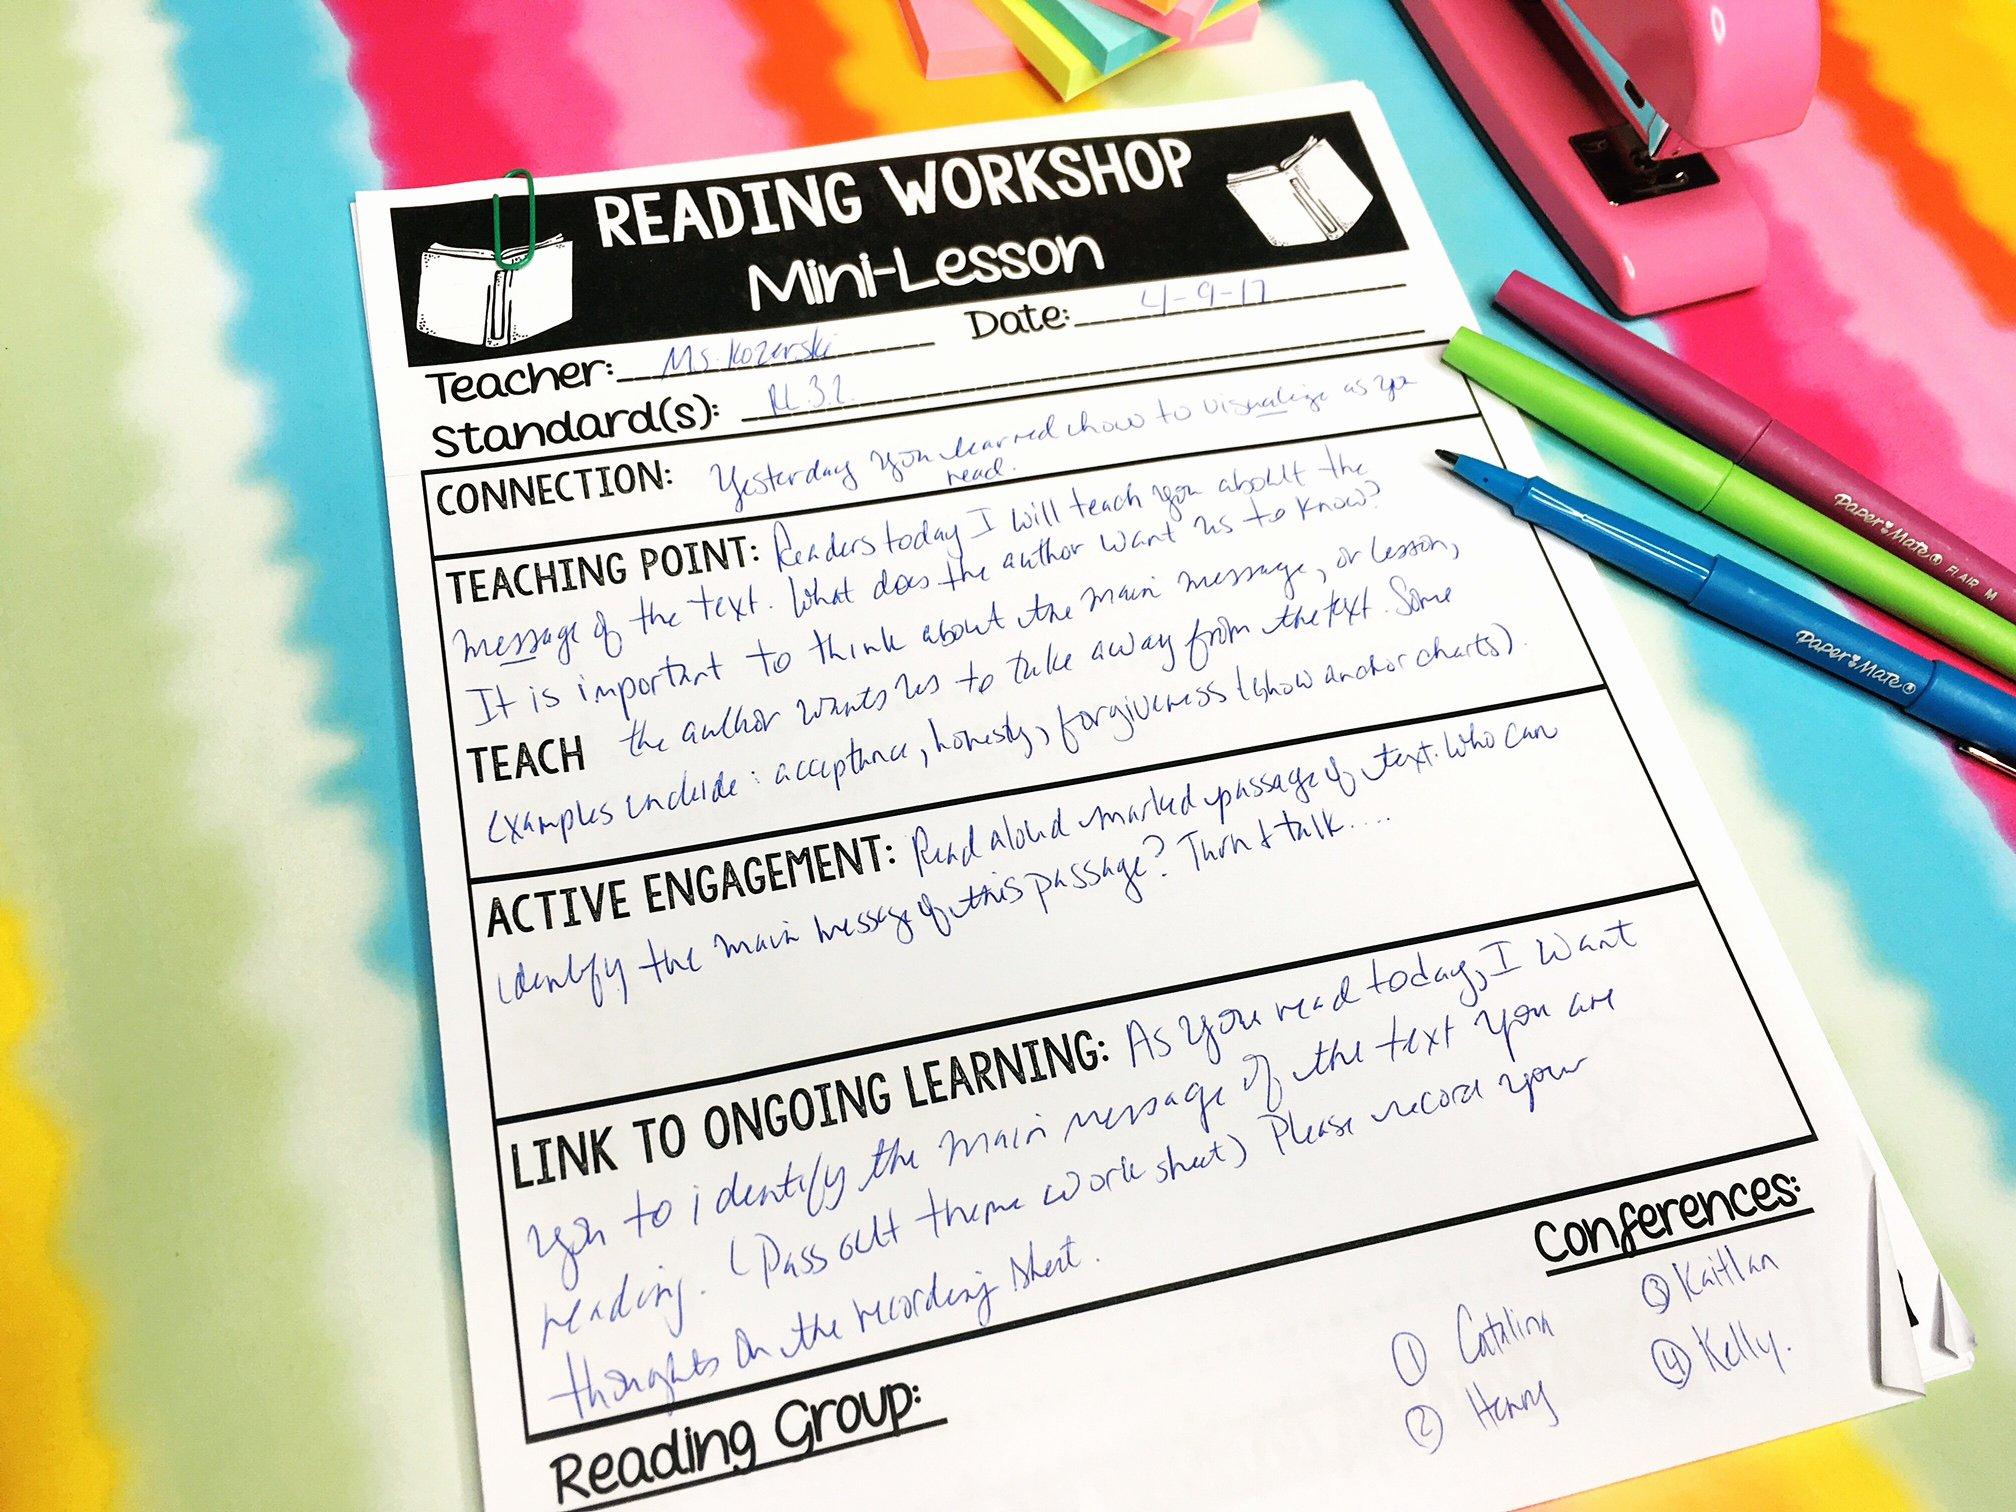 Mini Lesson Plan Template Inspirational Reading Workshop Mini Lesson Template Inspire Me asap